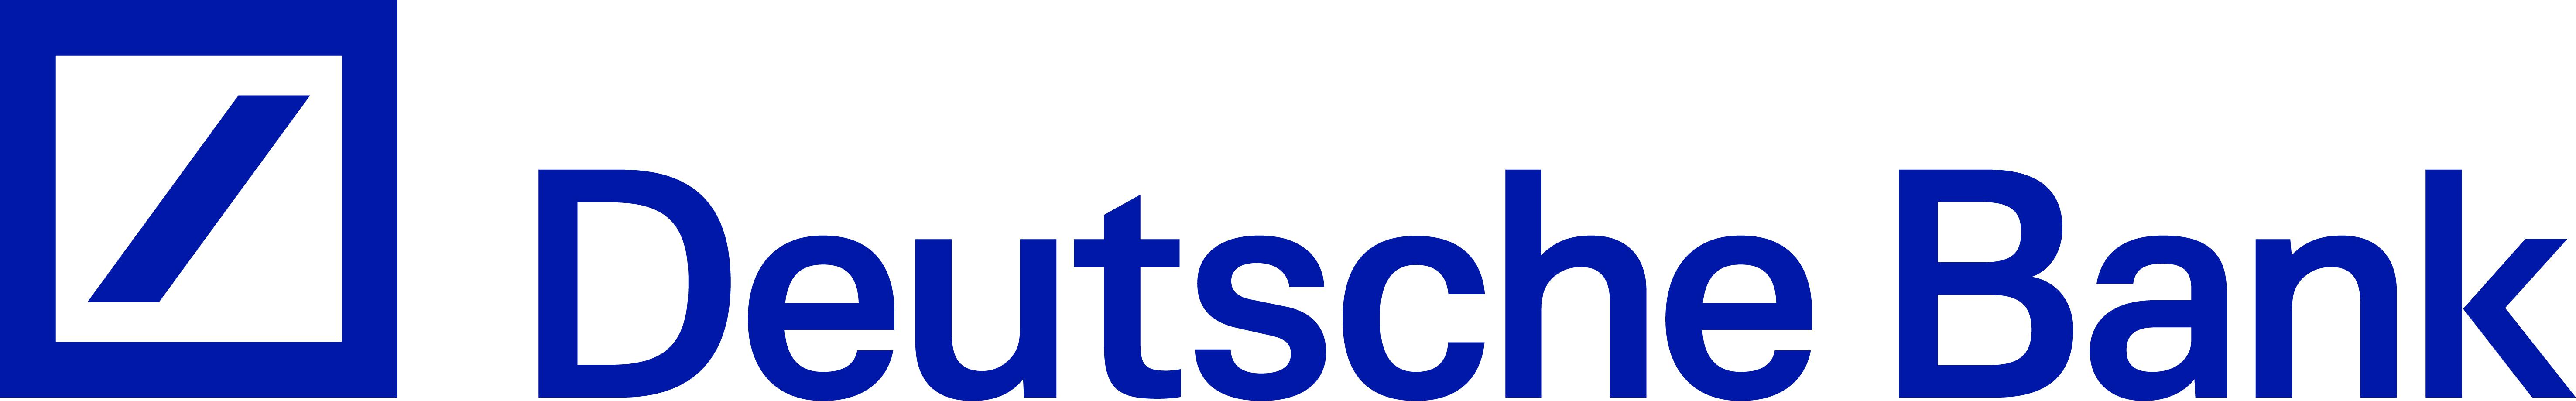 logotype_large_app_dbblue_lefthanded